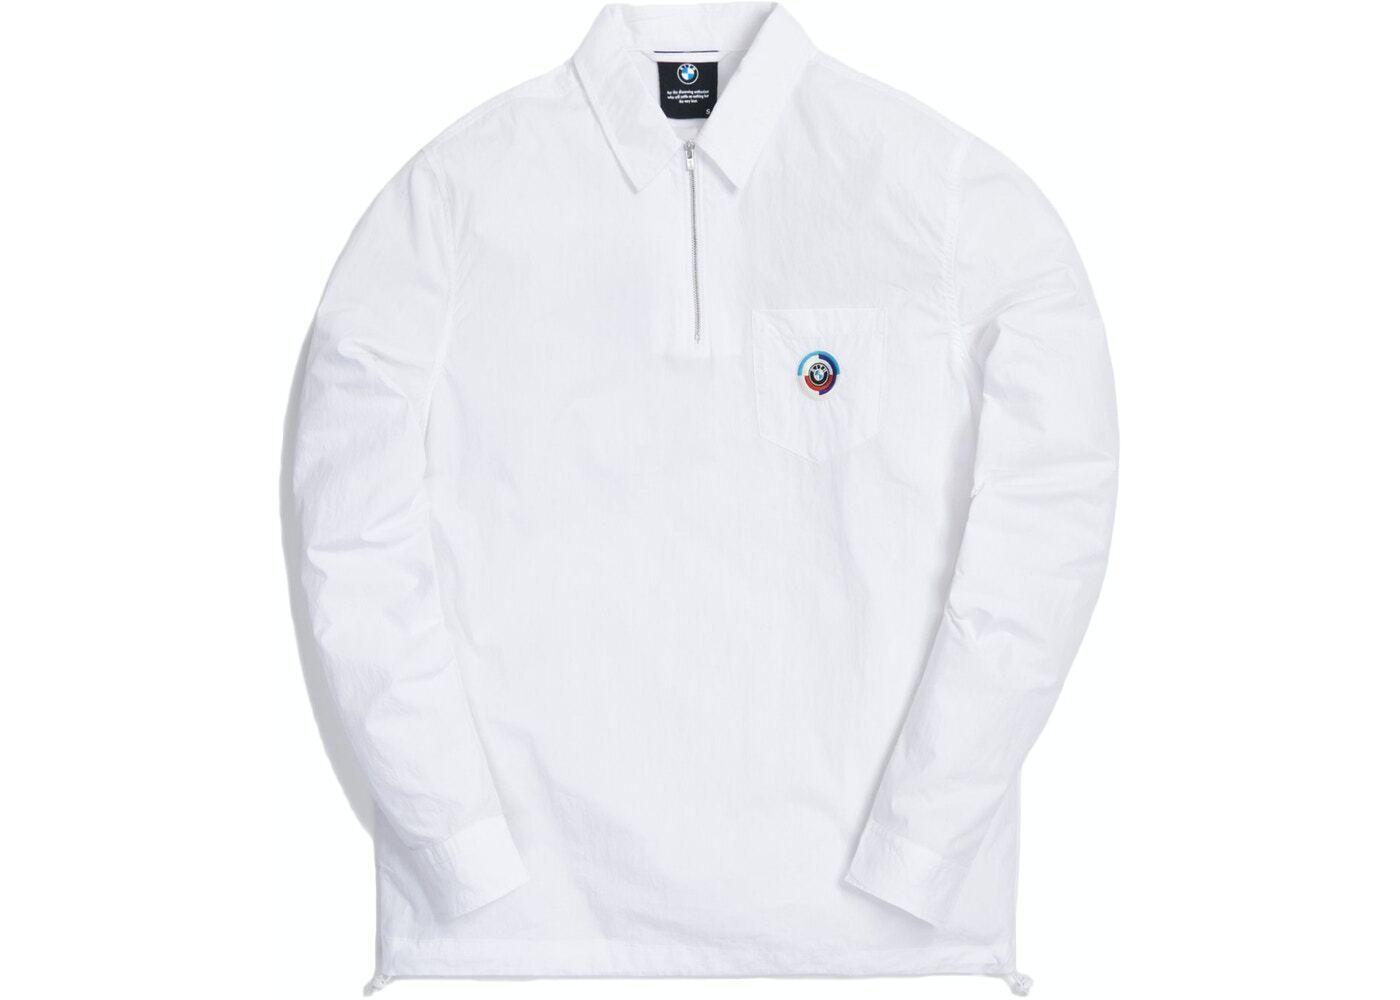 Kith x BMW Quarter Zip Collared Shirt Whiteの写真